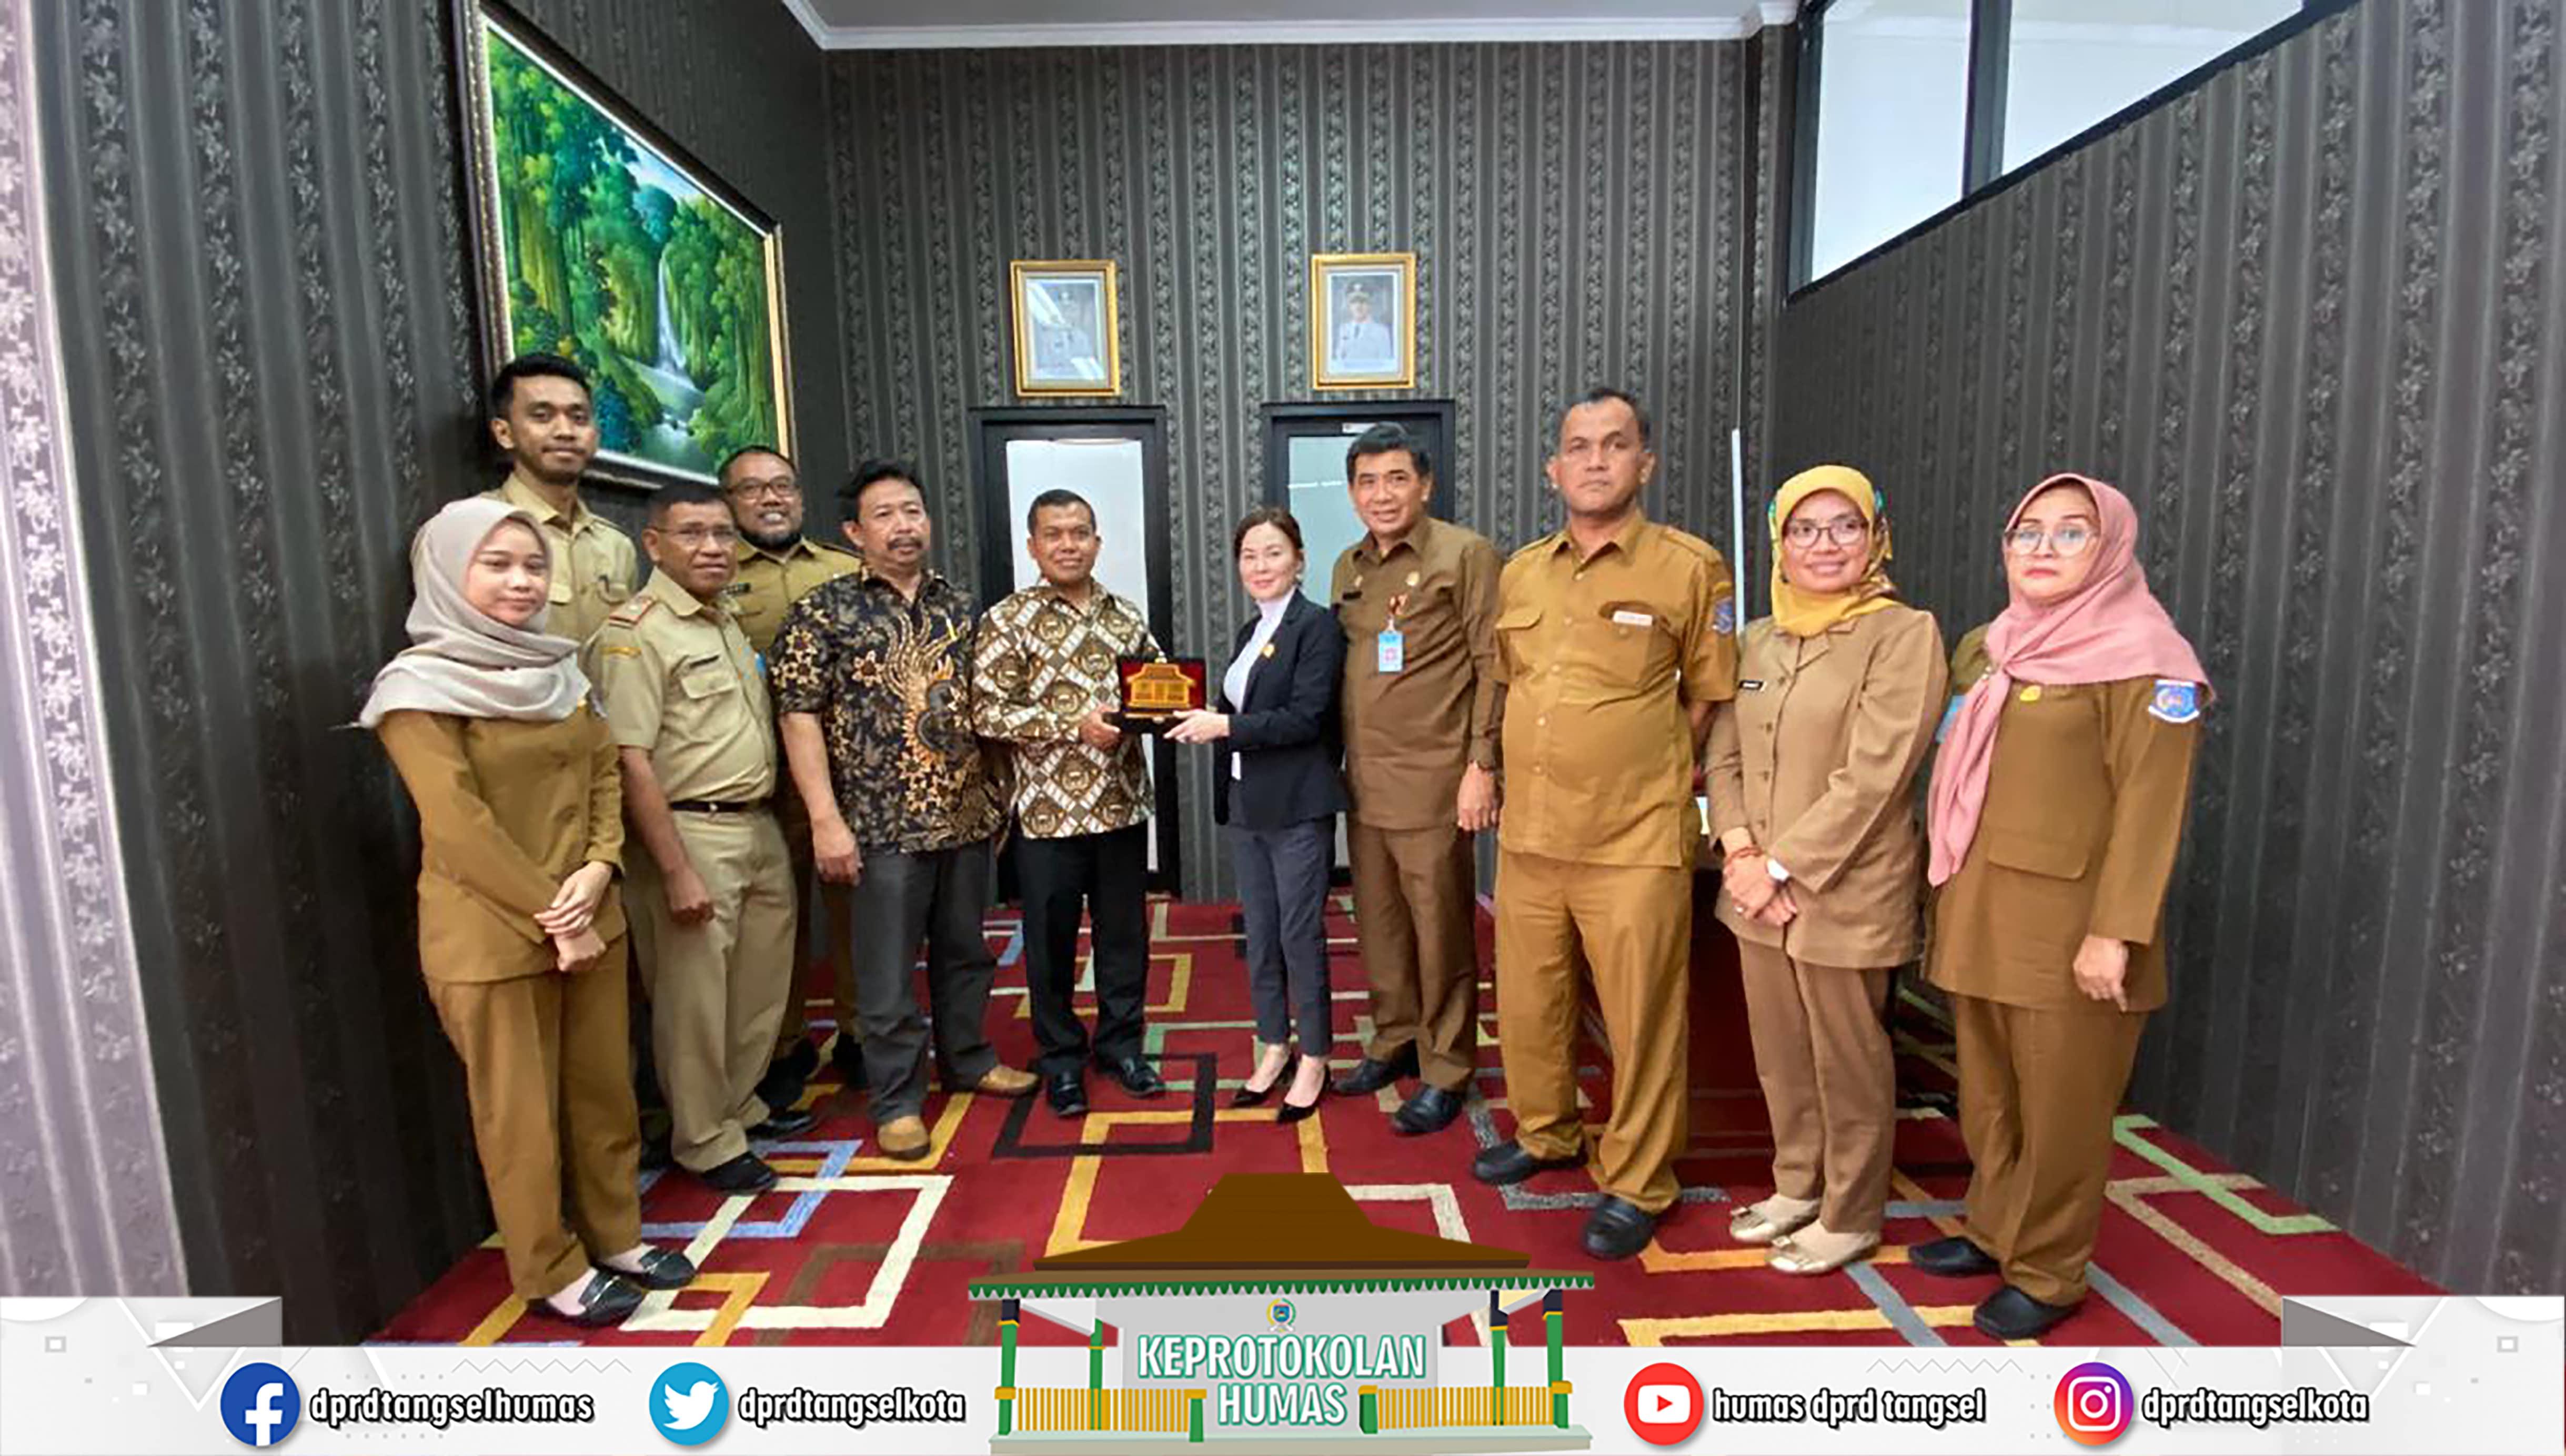 Wakil DPRD Li Claudia Chandra Konsultasi ke DPRD Kab. Bandung Barat